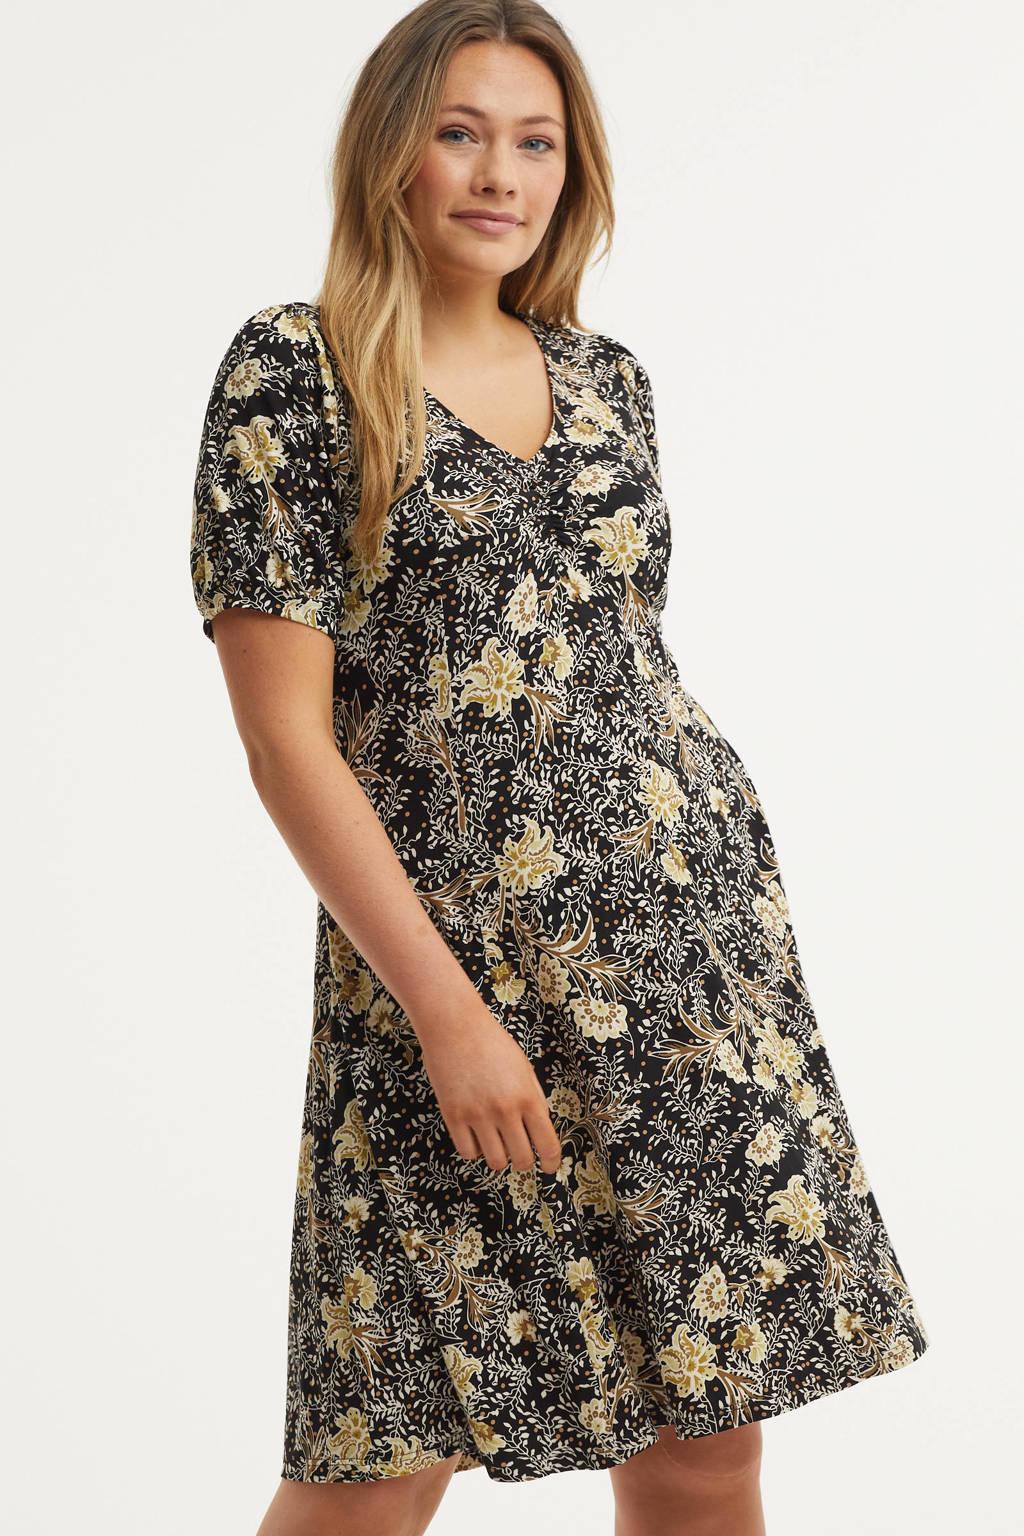 Zhenzi A-lijn jurk ESNA  met all over print zwart/wit/lichtgeel, Zwart/wit/lichtgeel